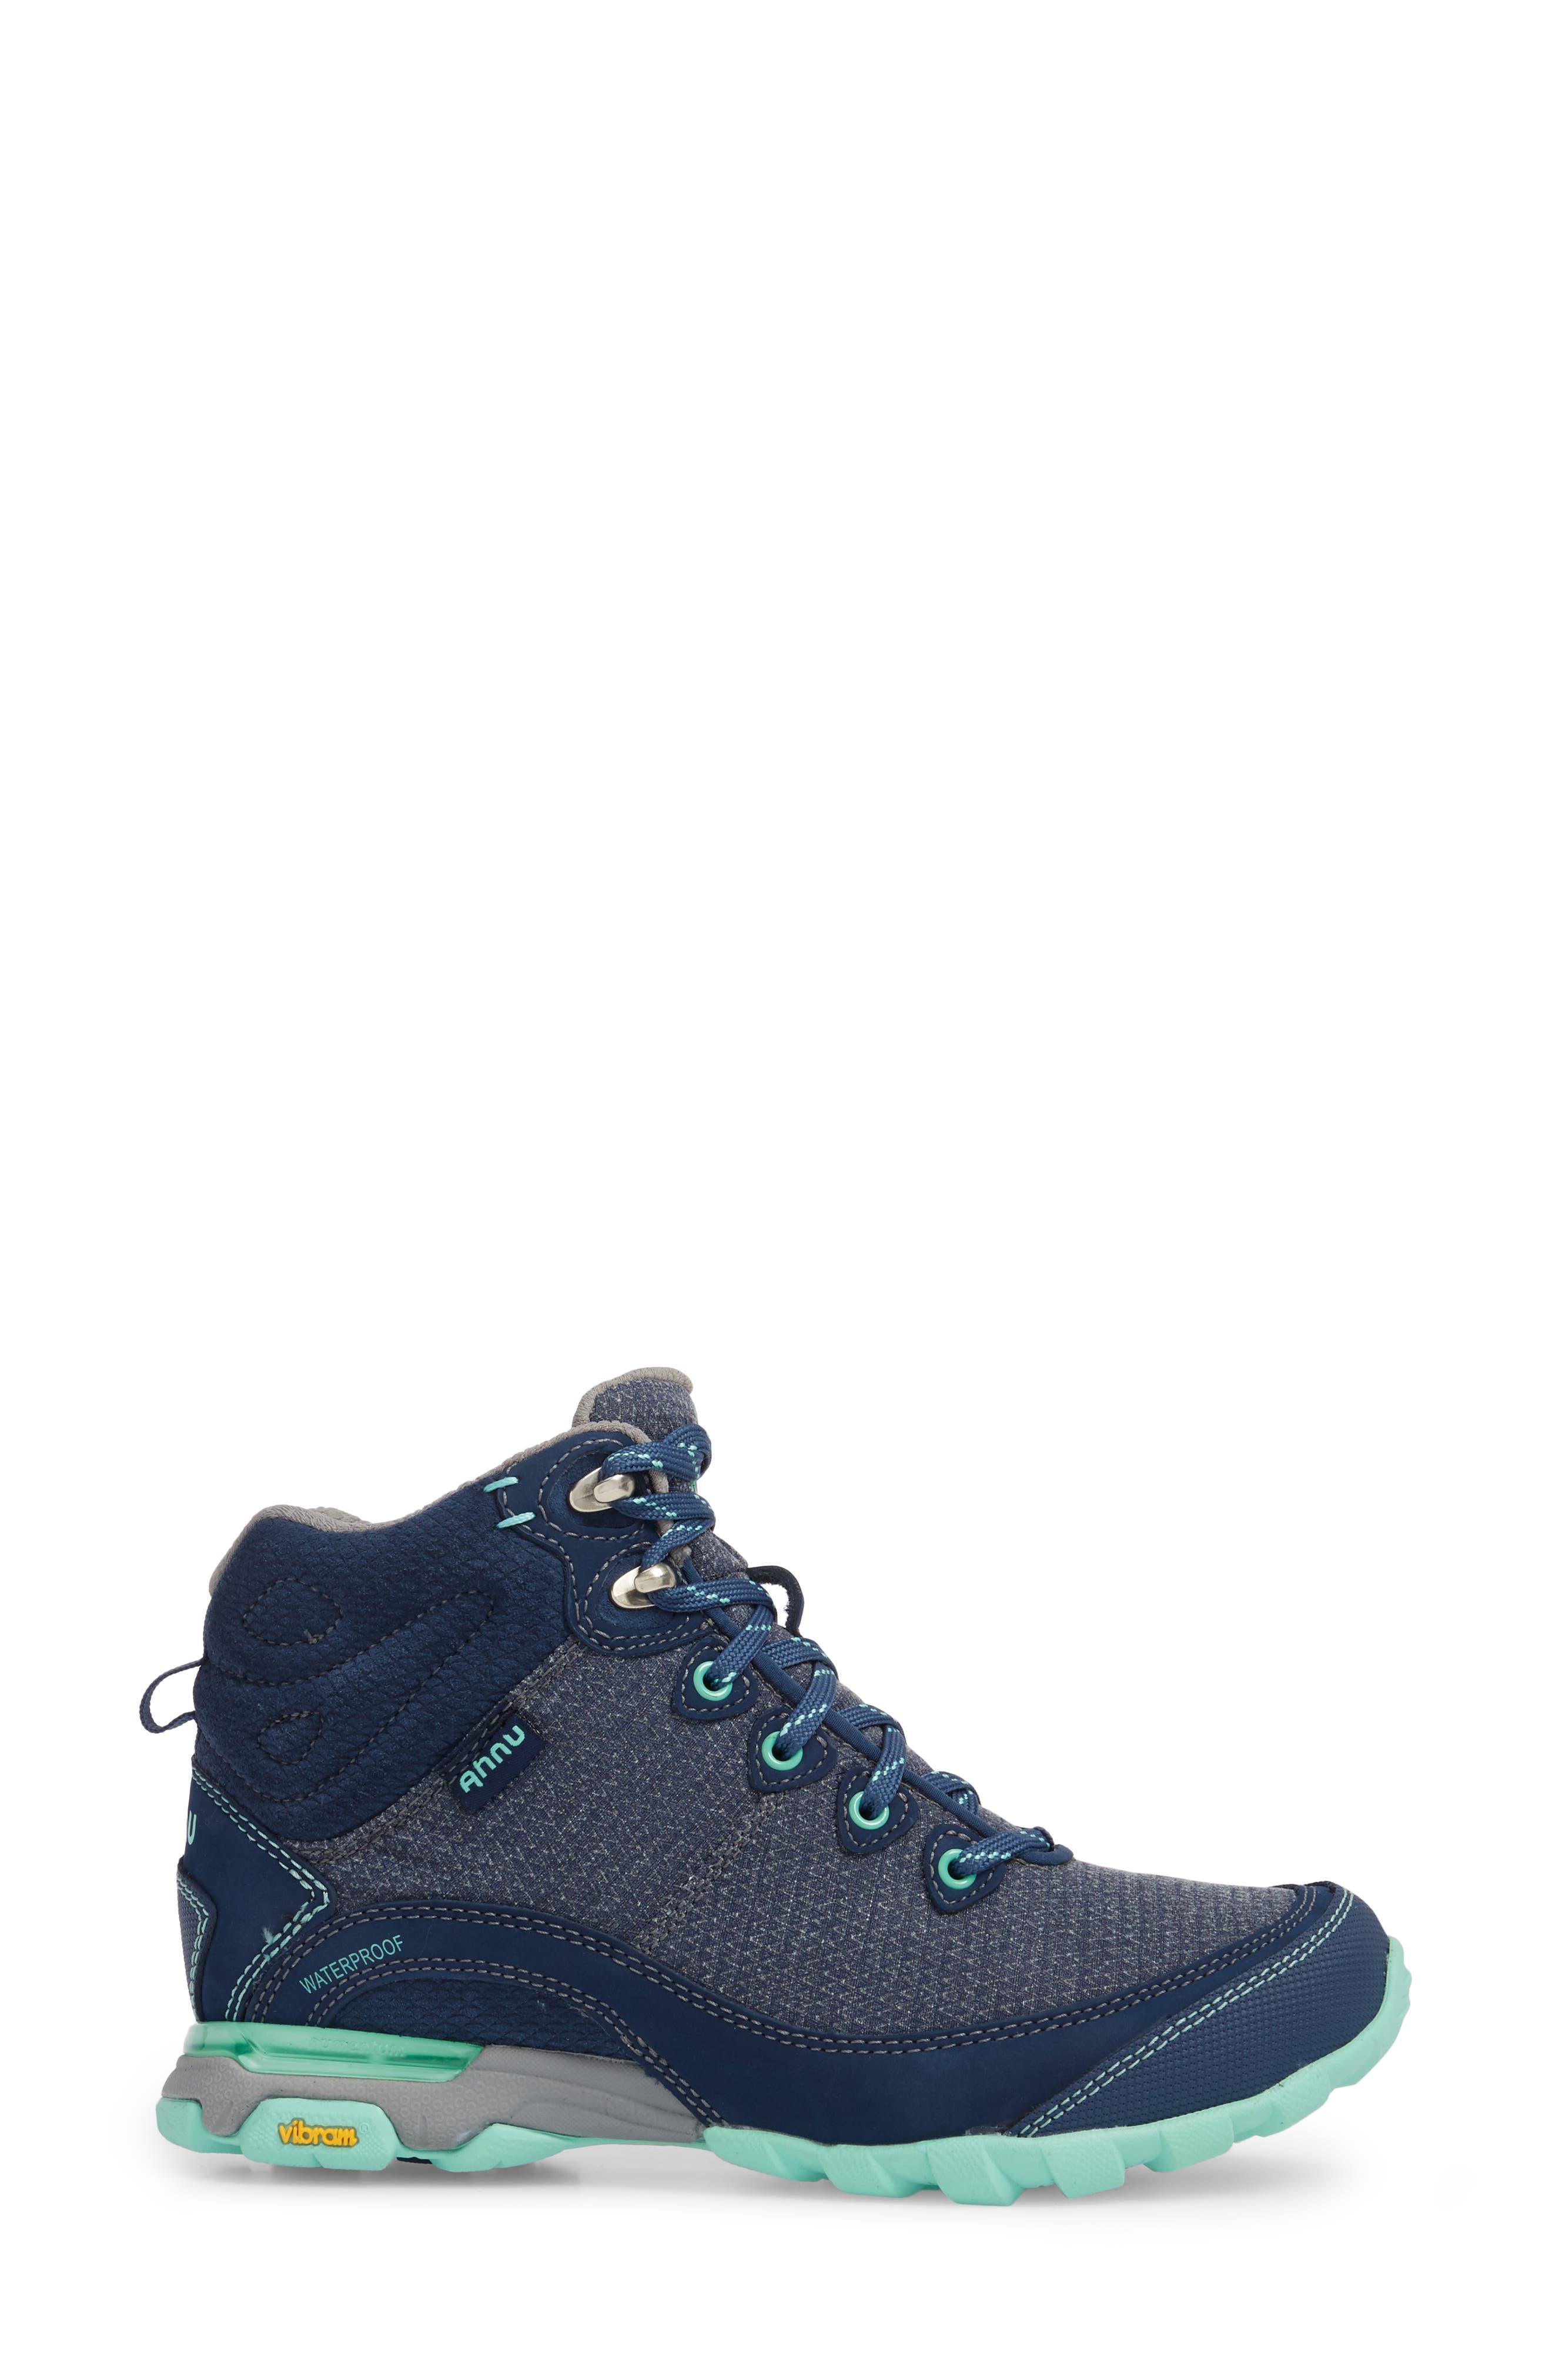 TEVA, Ahnu by Teva Sugarpine II Waterproof Hiking Boot, Alternate thumbnail 3, color, INSIGNIA BLUE